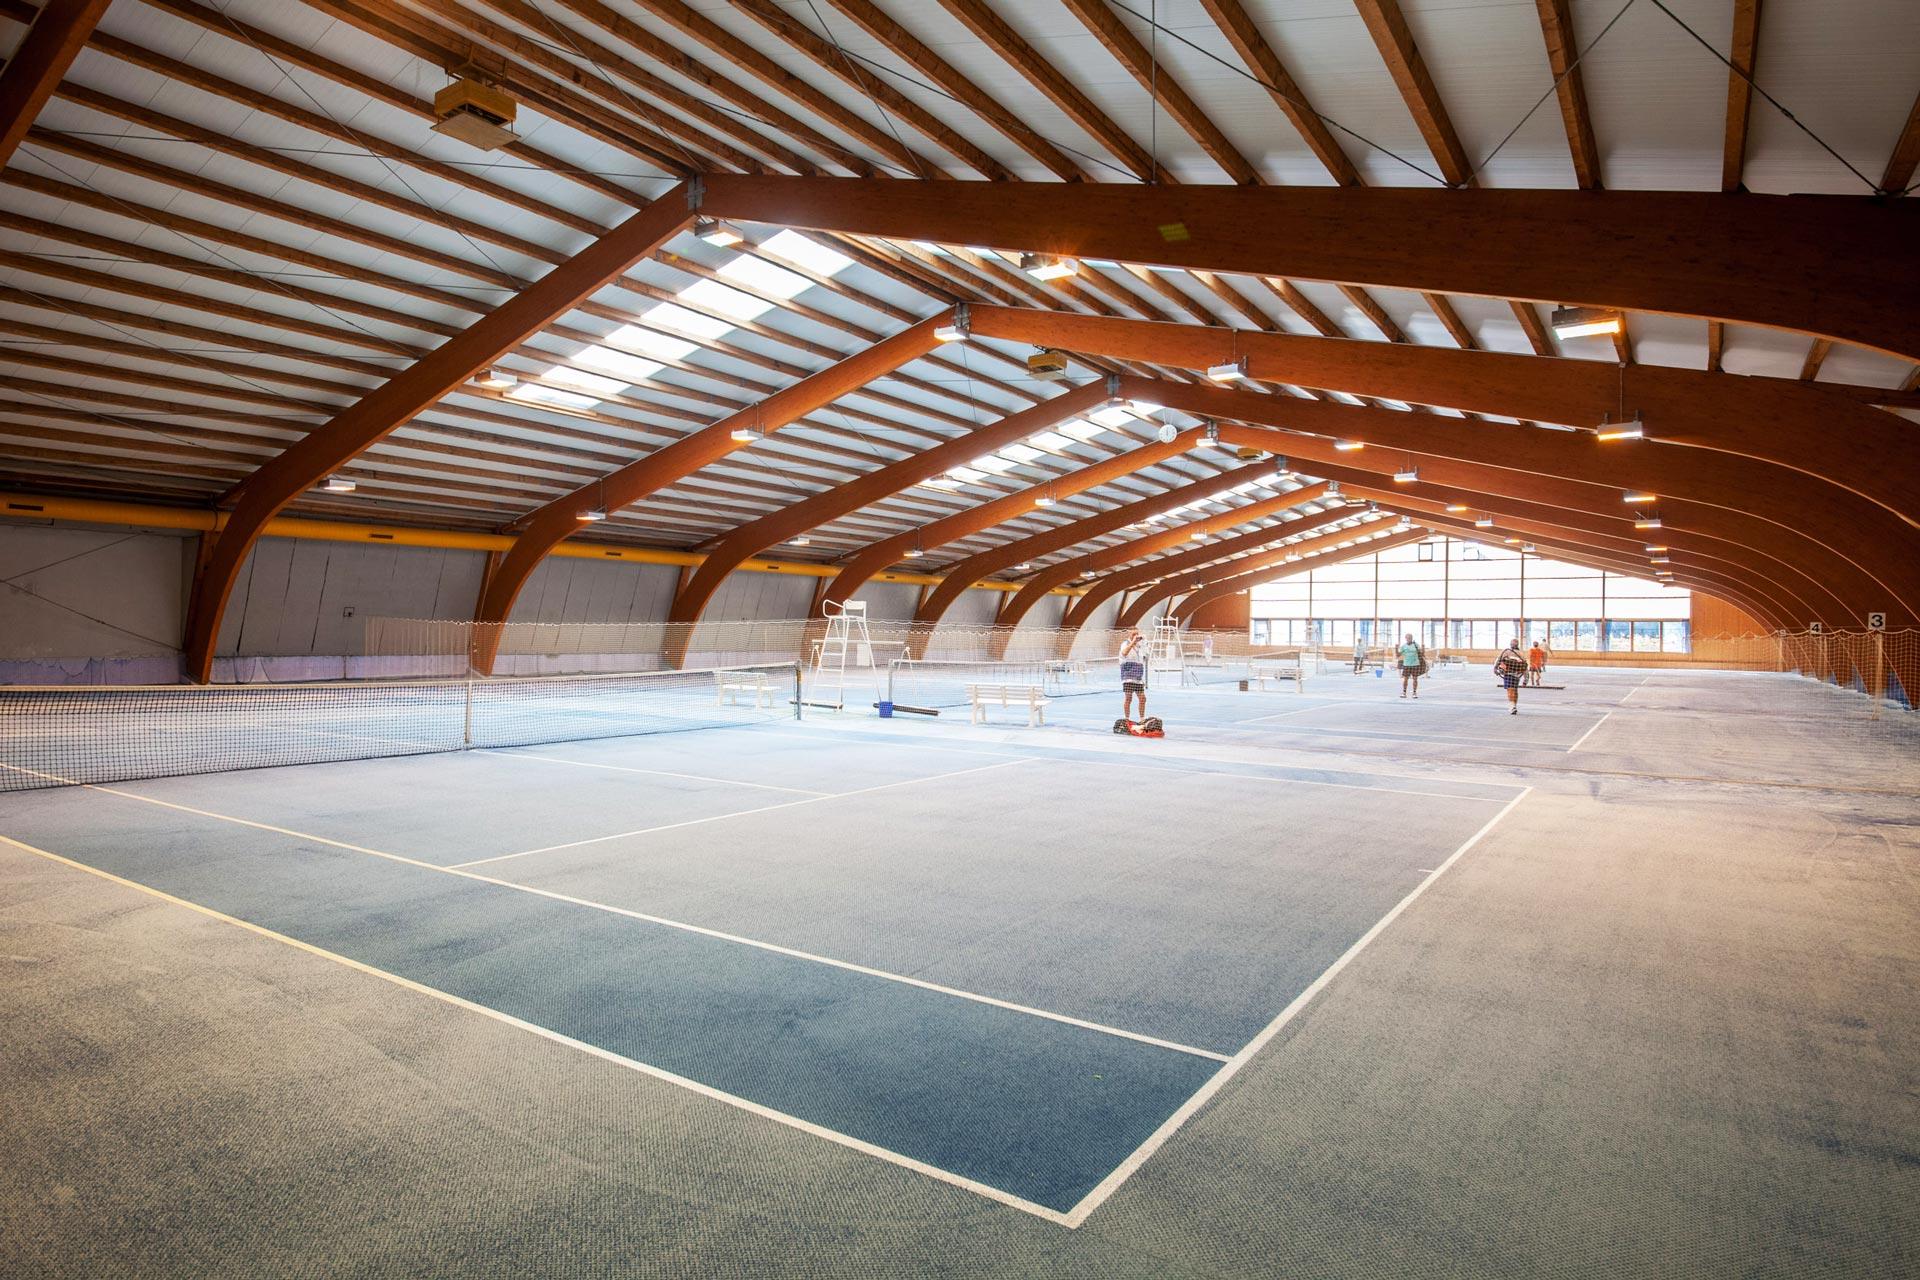 tennis-indoor-sportpark-kippenheim-1920x1280px